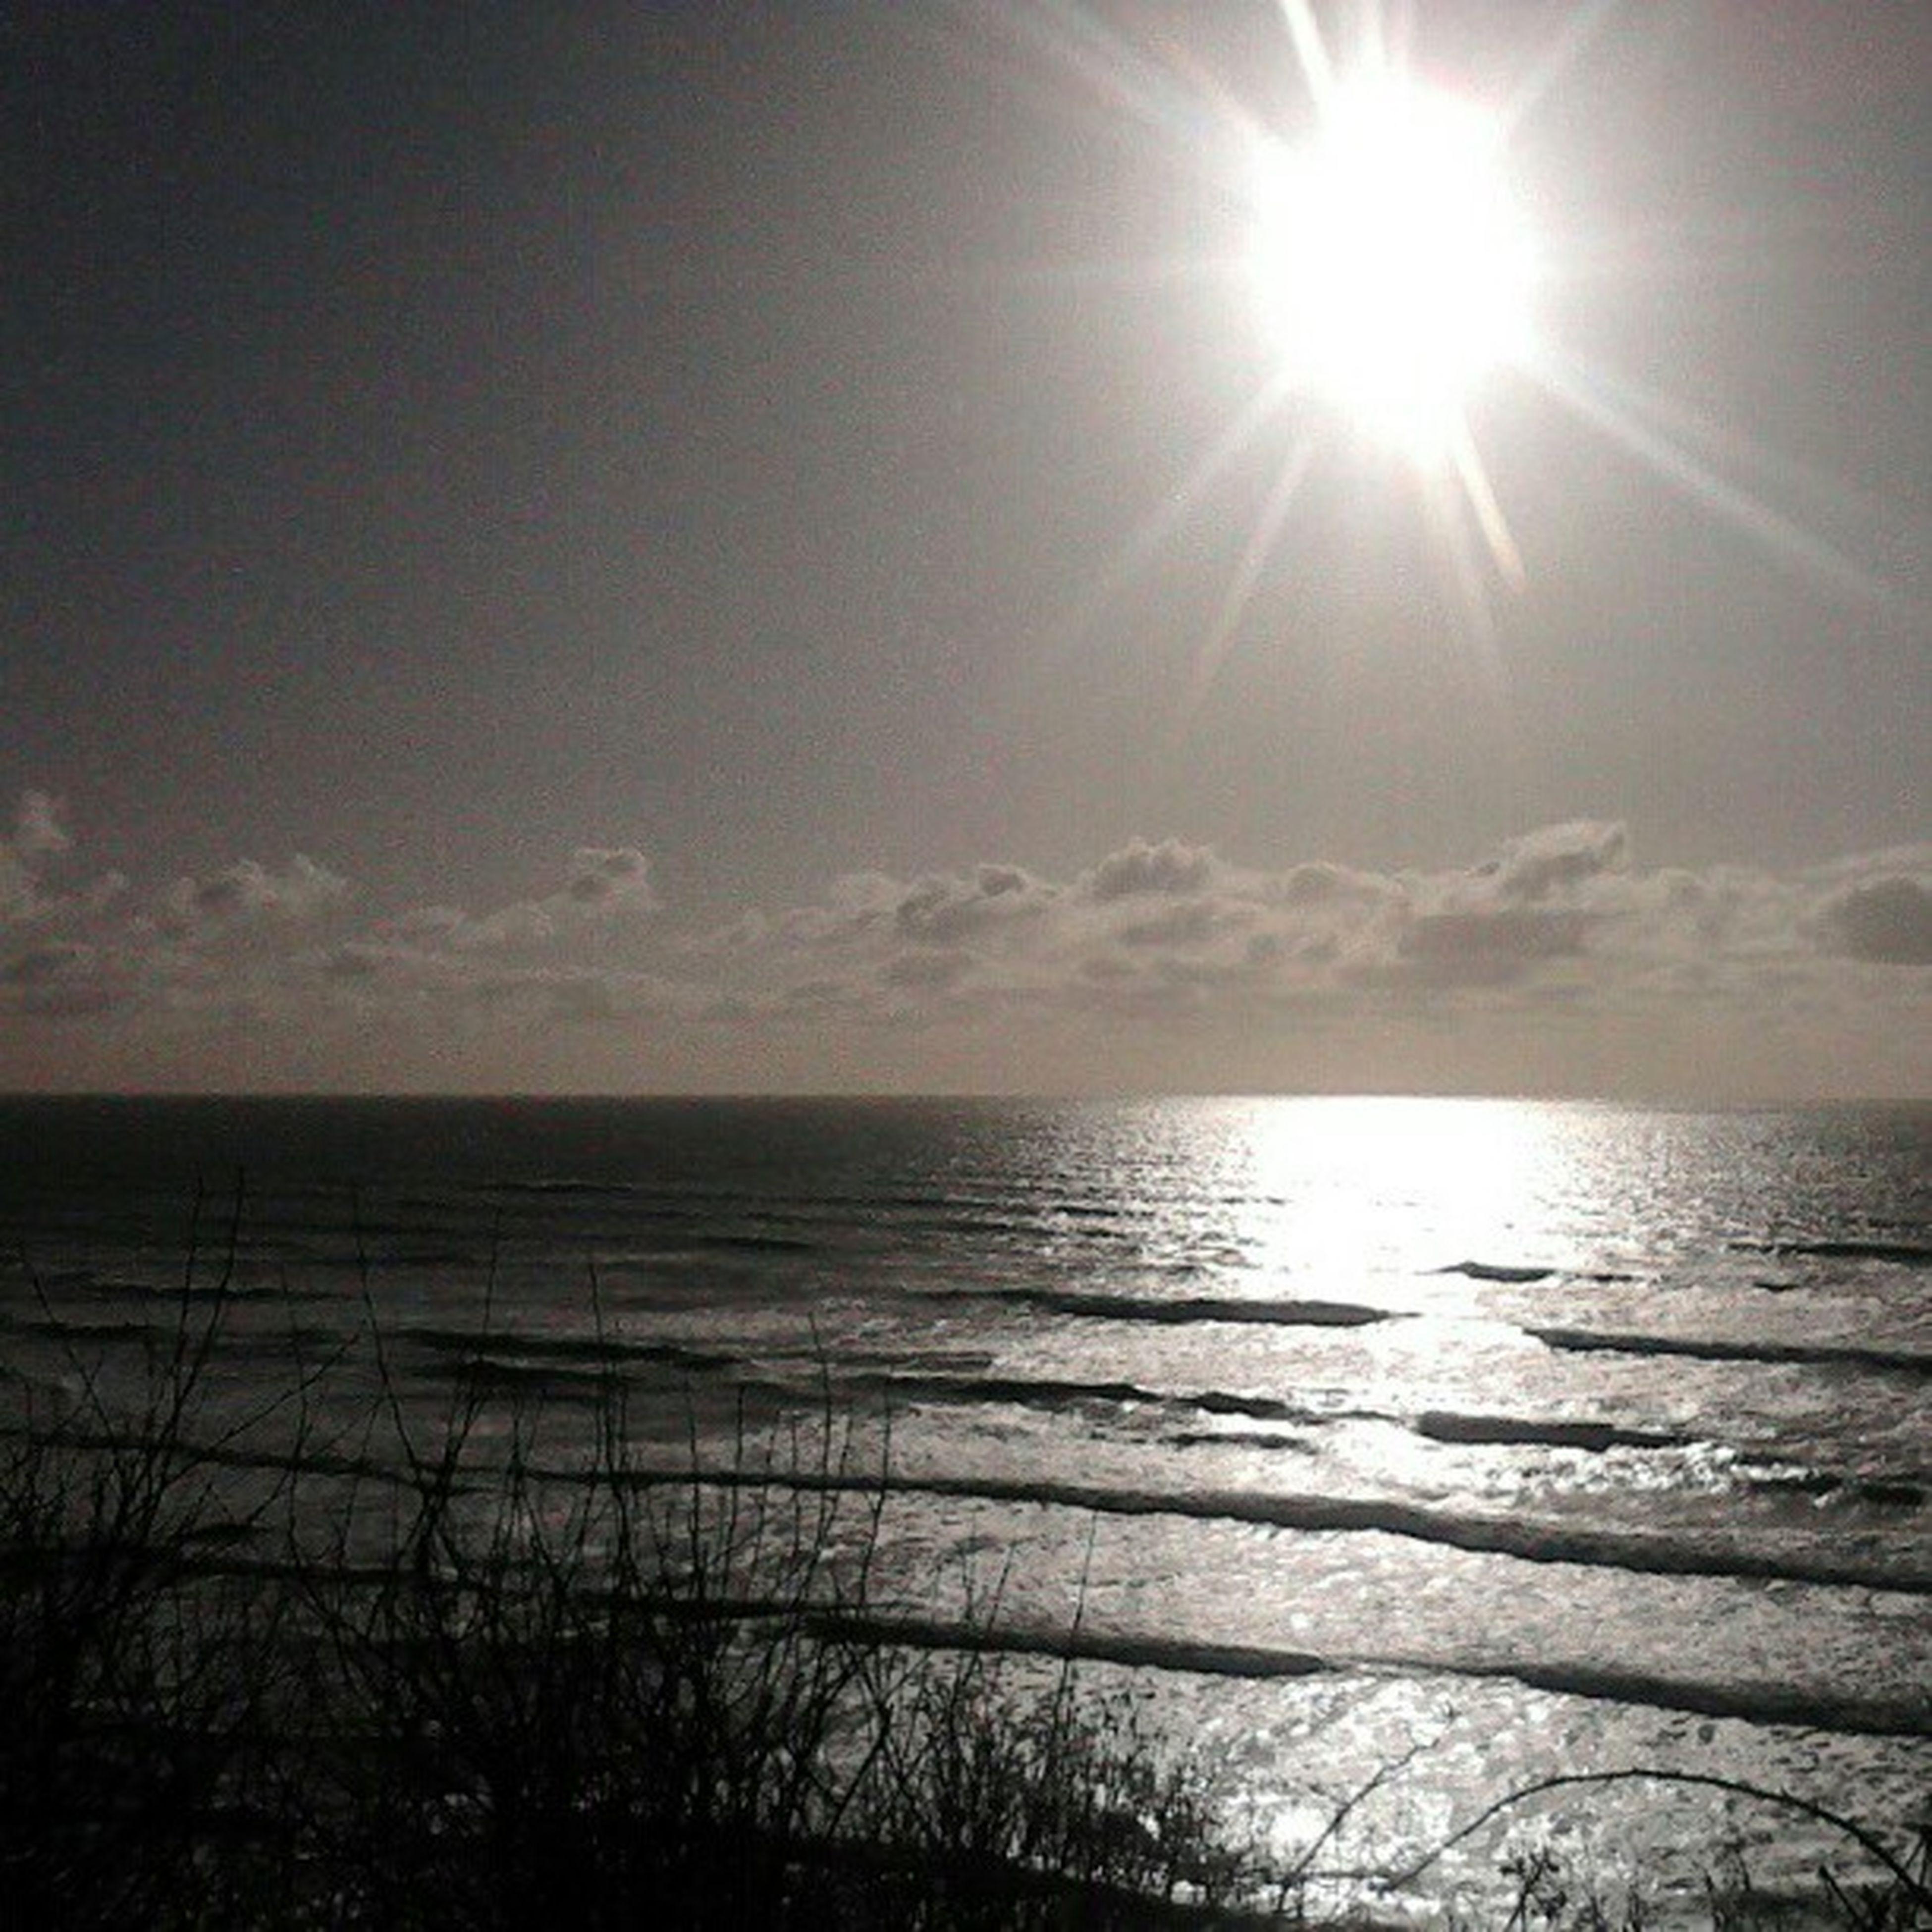 sea, sun, horizon over water, water, tranquil scene, scenics, tranquility, beauty in nature, sunbeam, sky, sunlight, reflection, nature, beach, idyllic, lens flare, sunset, seascape, shore, bright